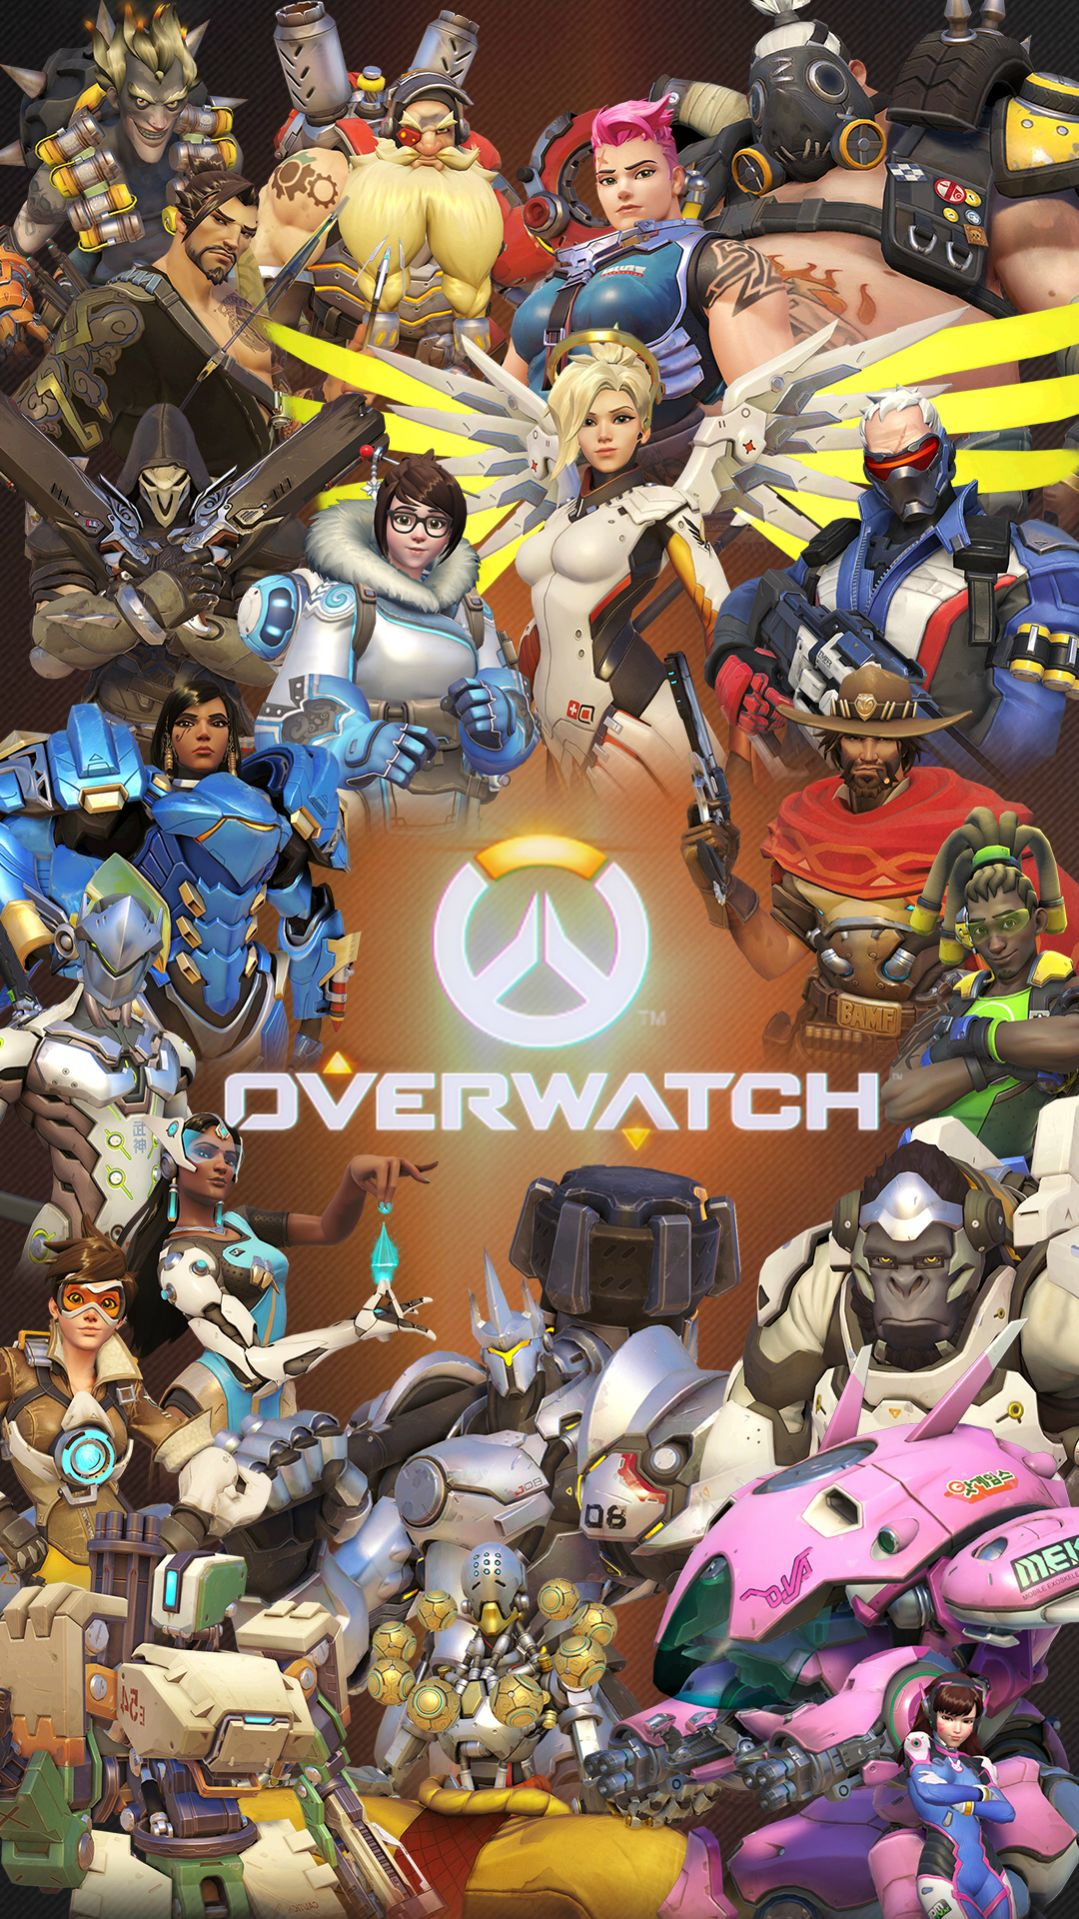 Overwatch Cute Sprays Wallpaper Fondos De Overwatch Para Android E Iphone Wallpapers